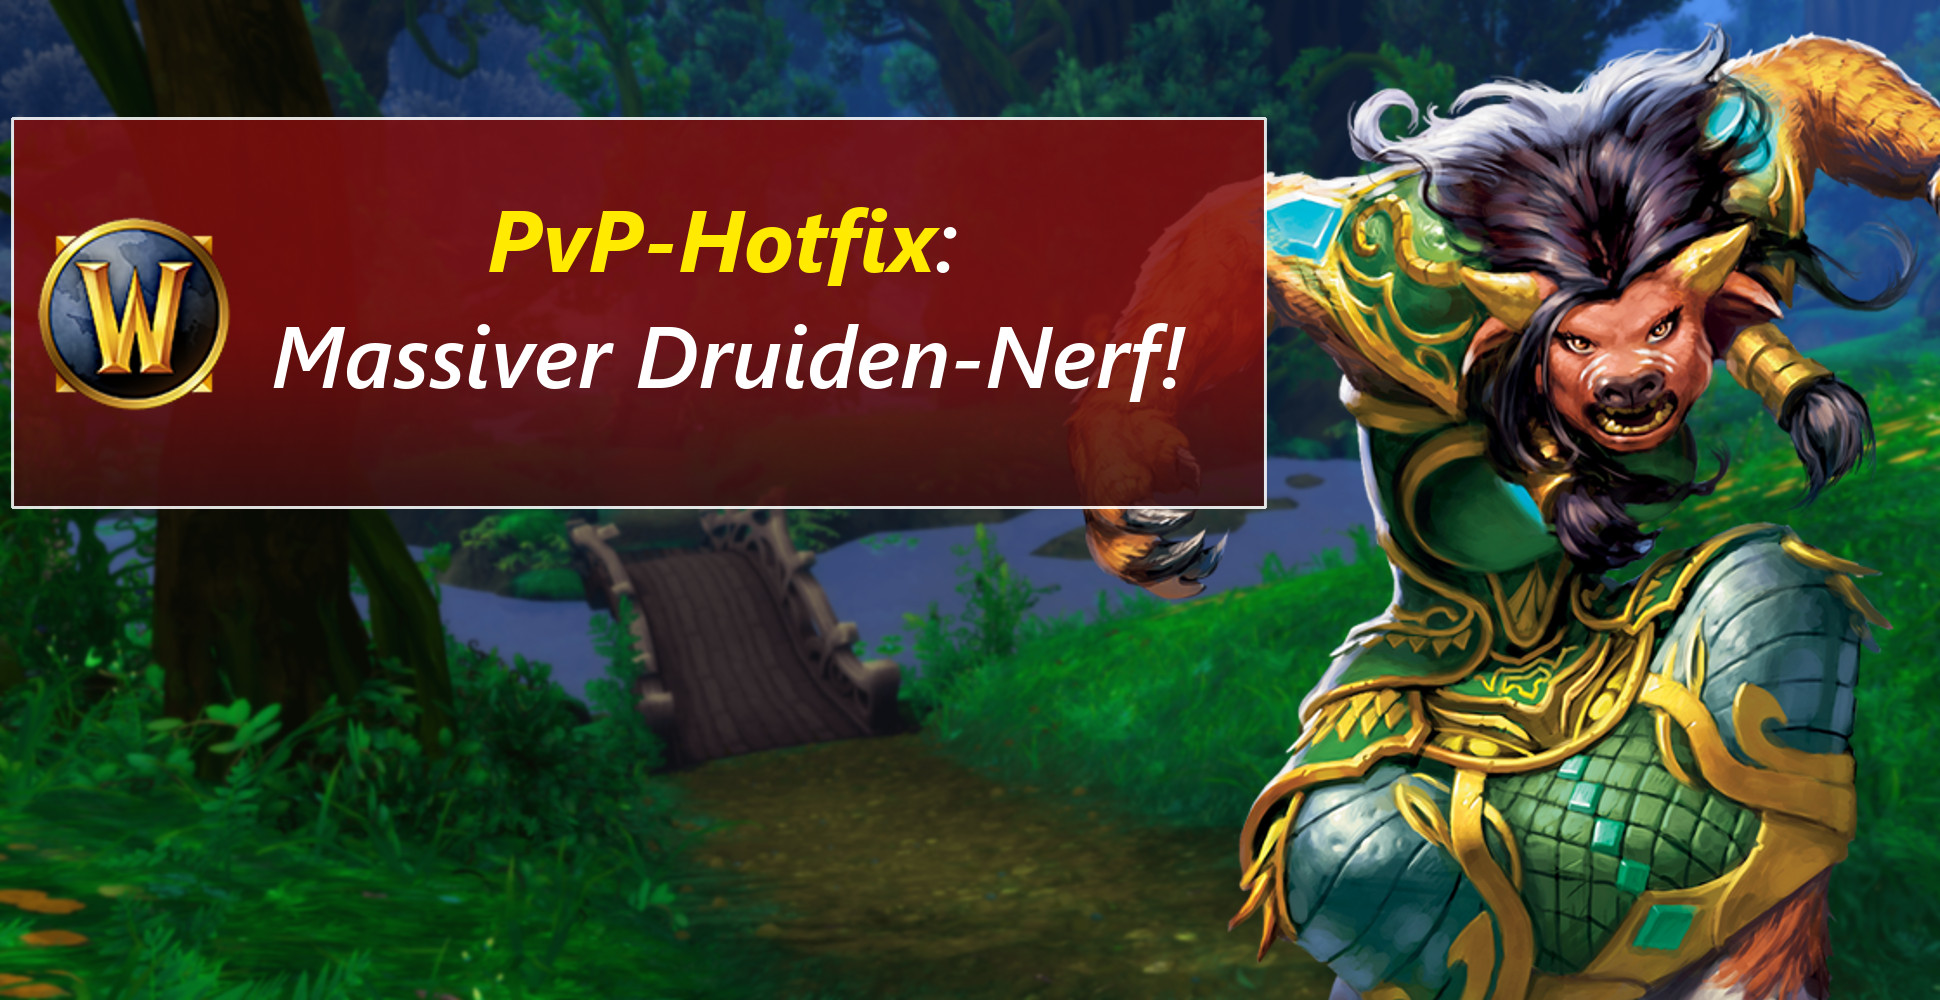 WoW: PvP-Hotfix – Druide wird stark generft!